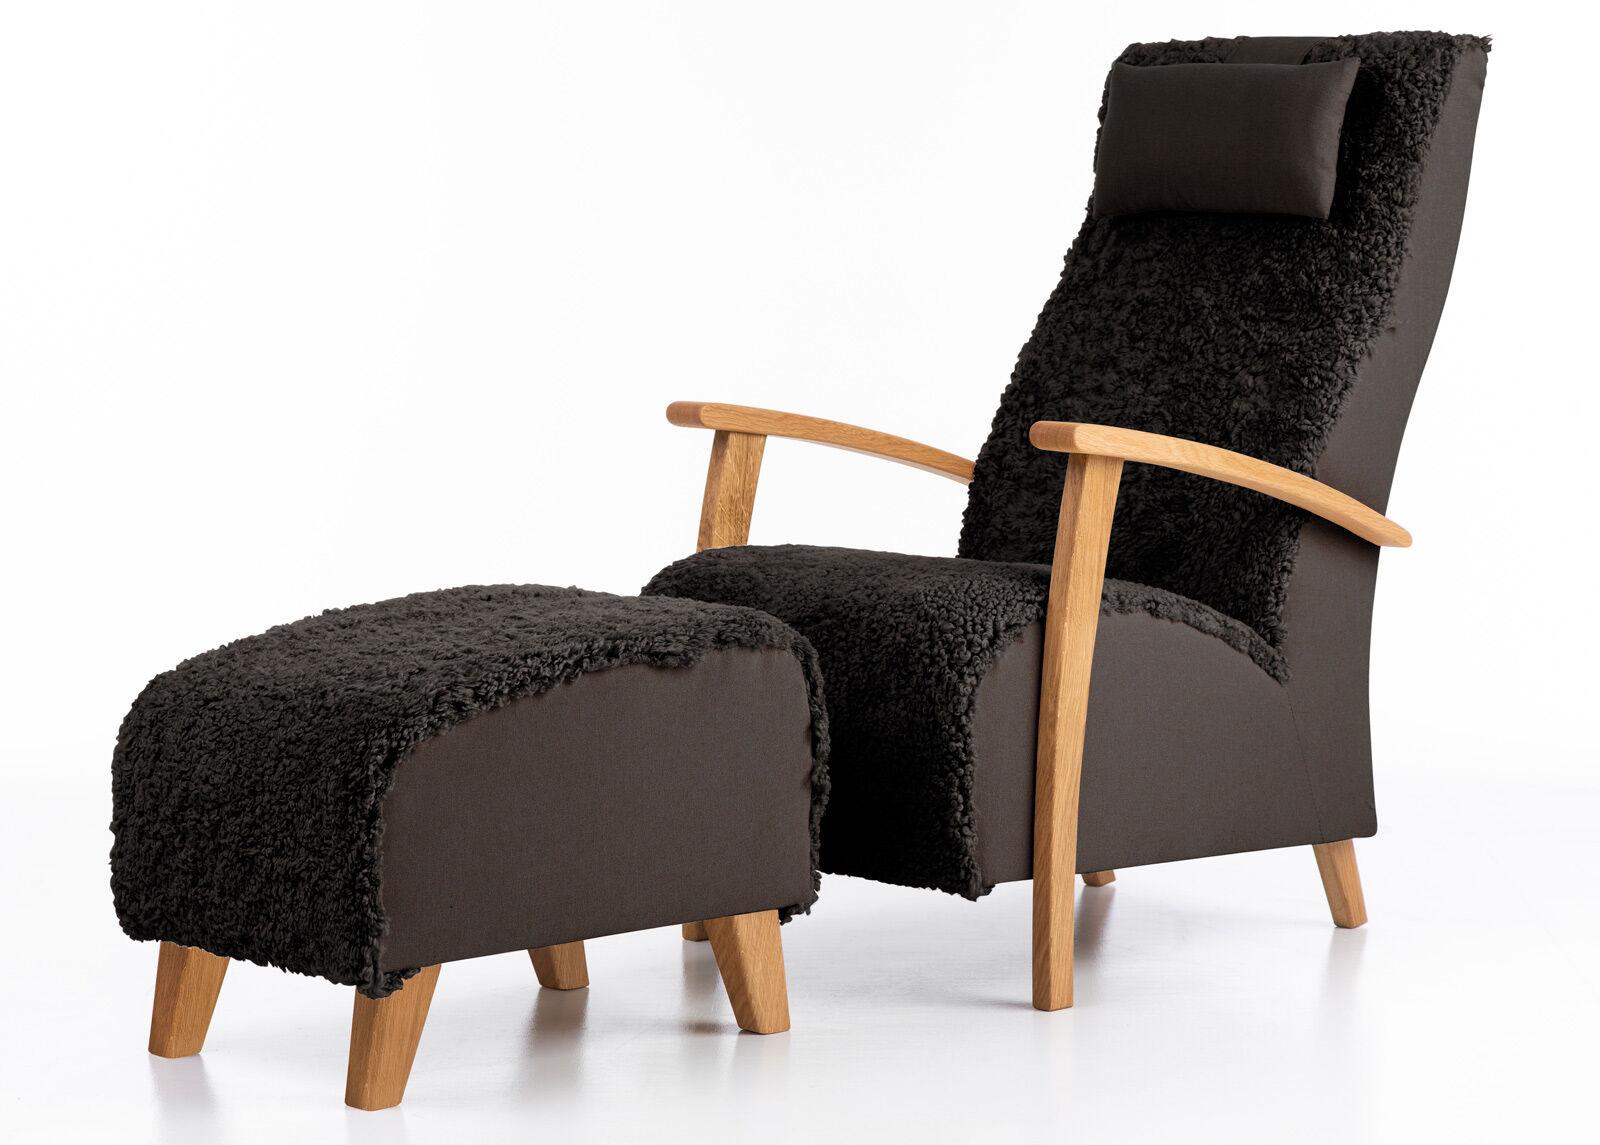 Võru Empak Nojatuoli aidolla lampaannahalla Wiivi + rahi